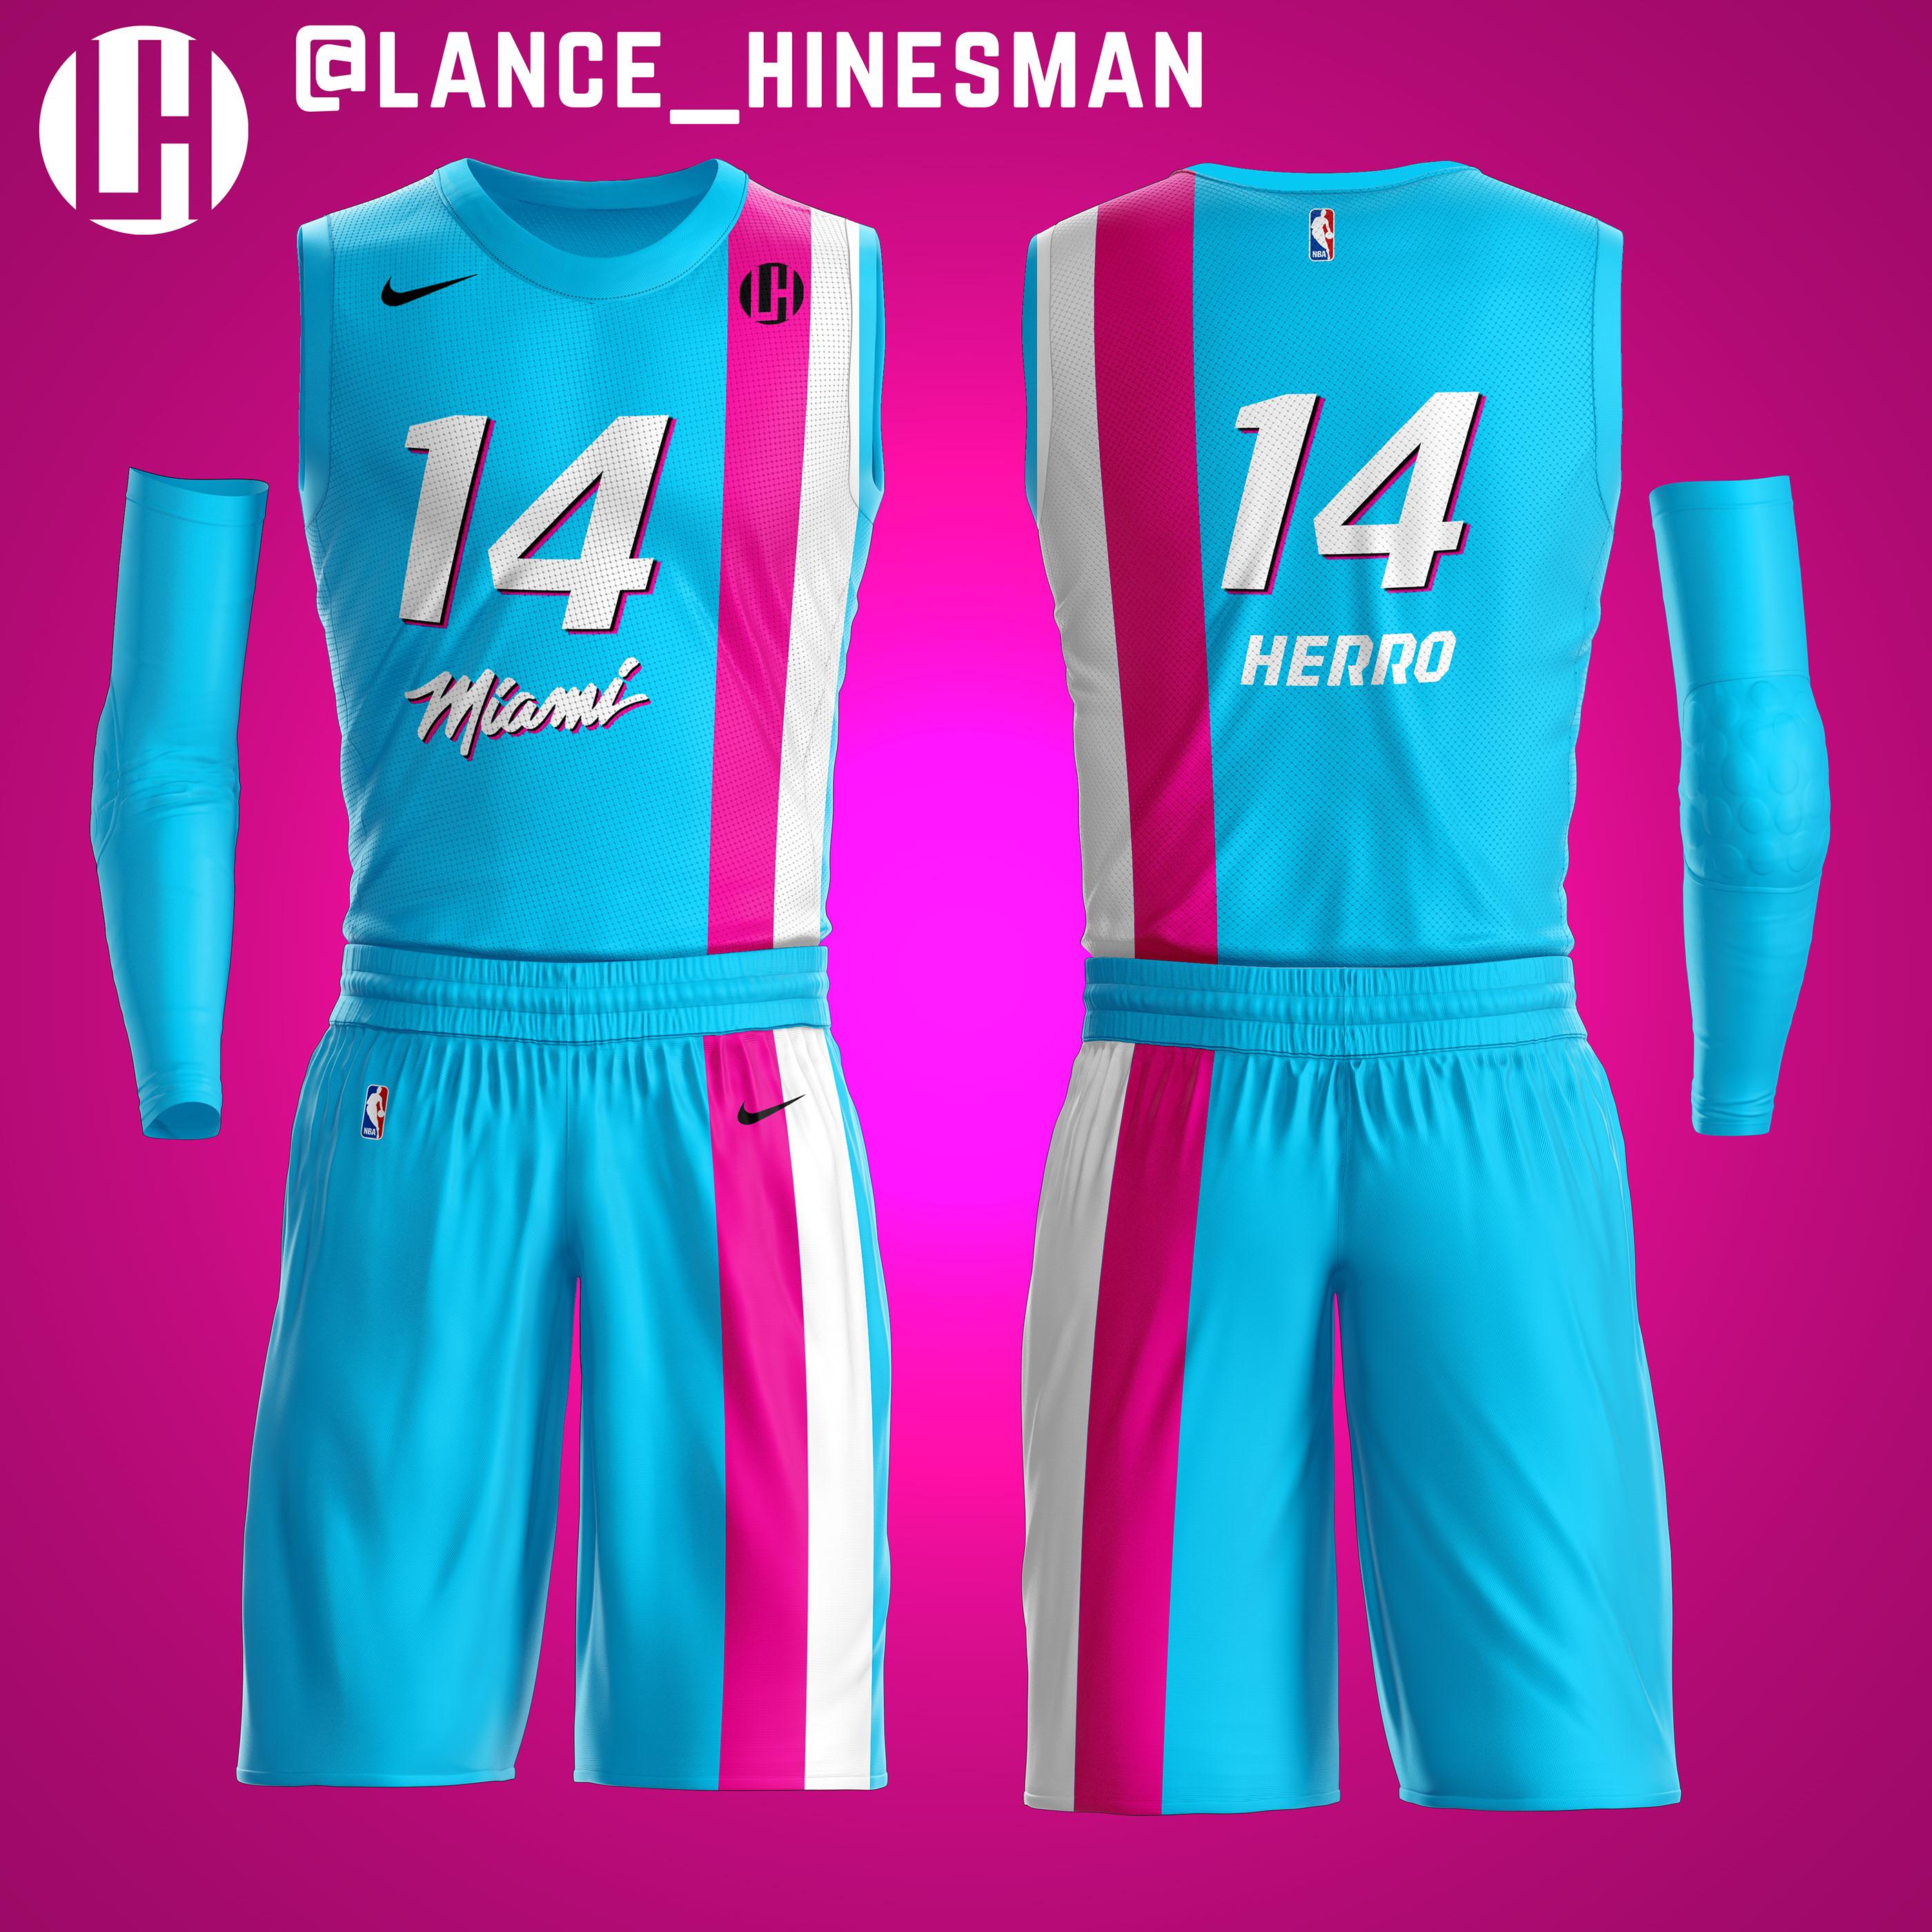 Miami Heat Vice Floridians Jersey Concept On Behance